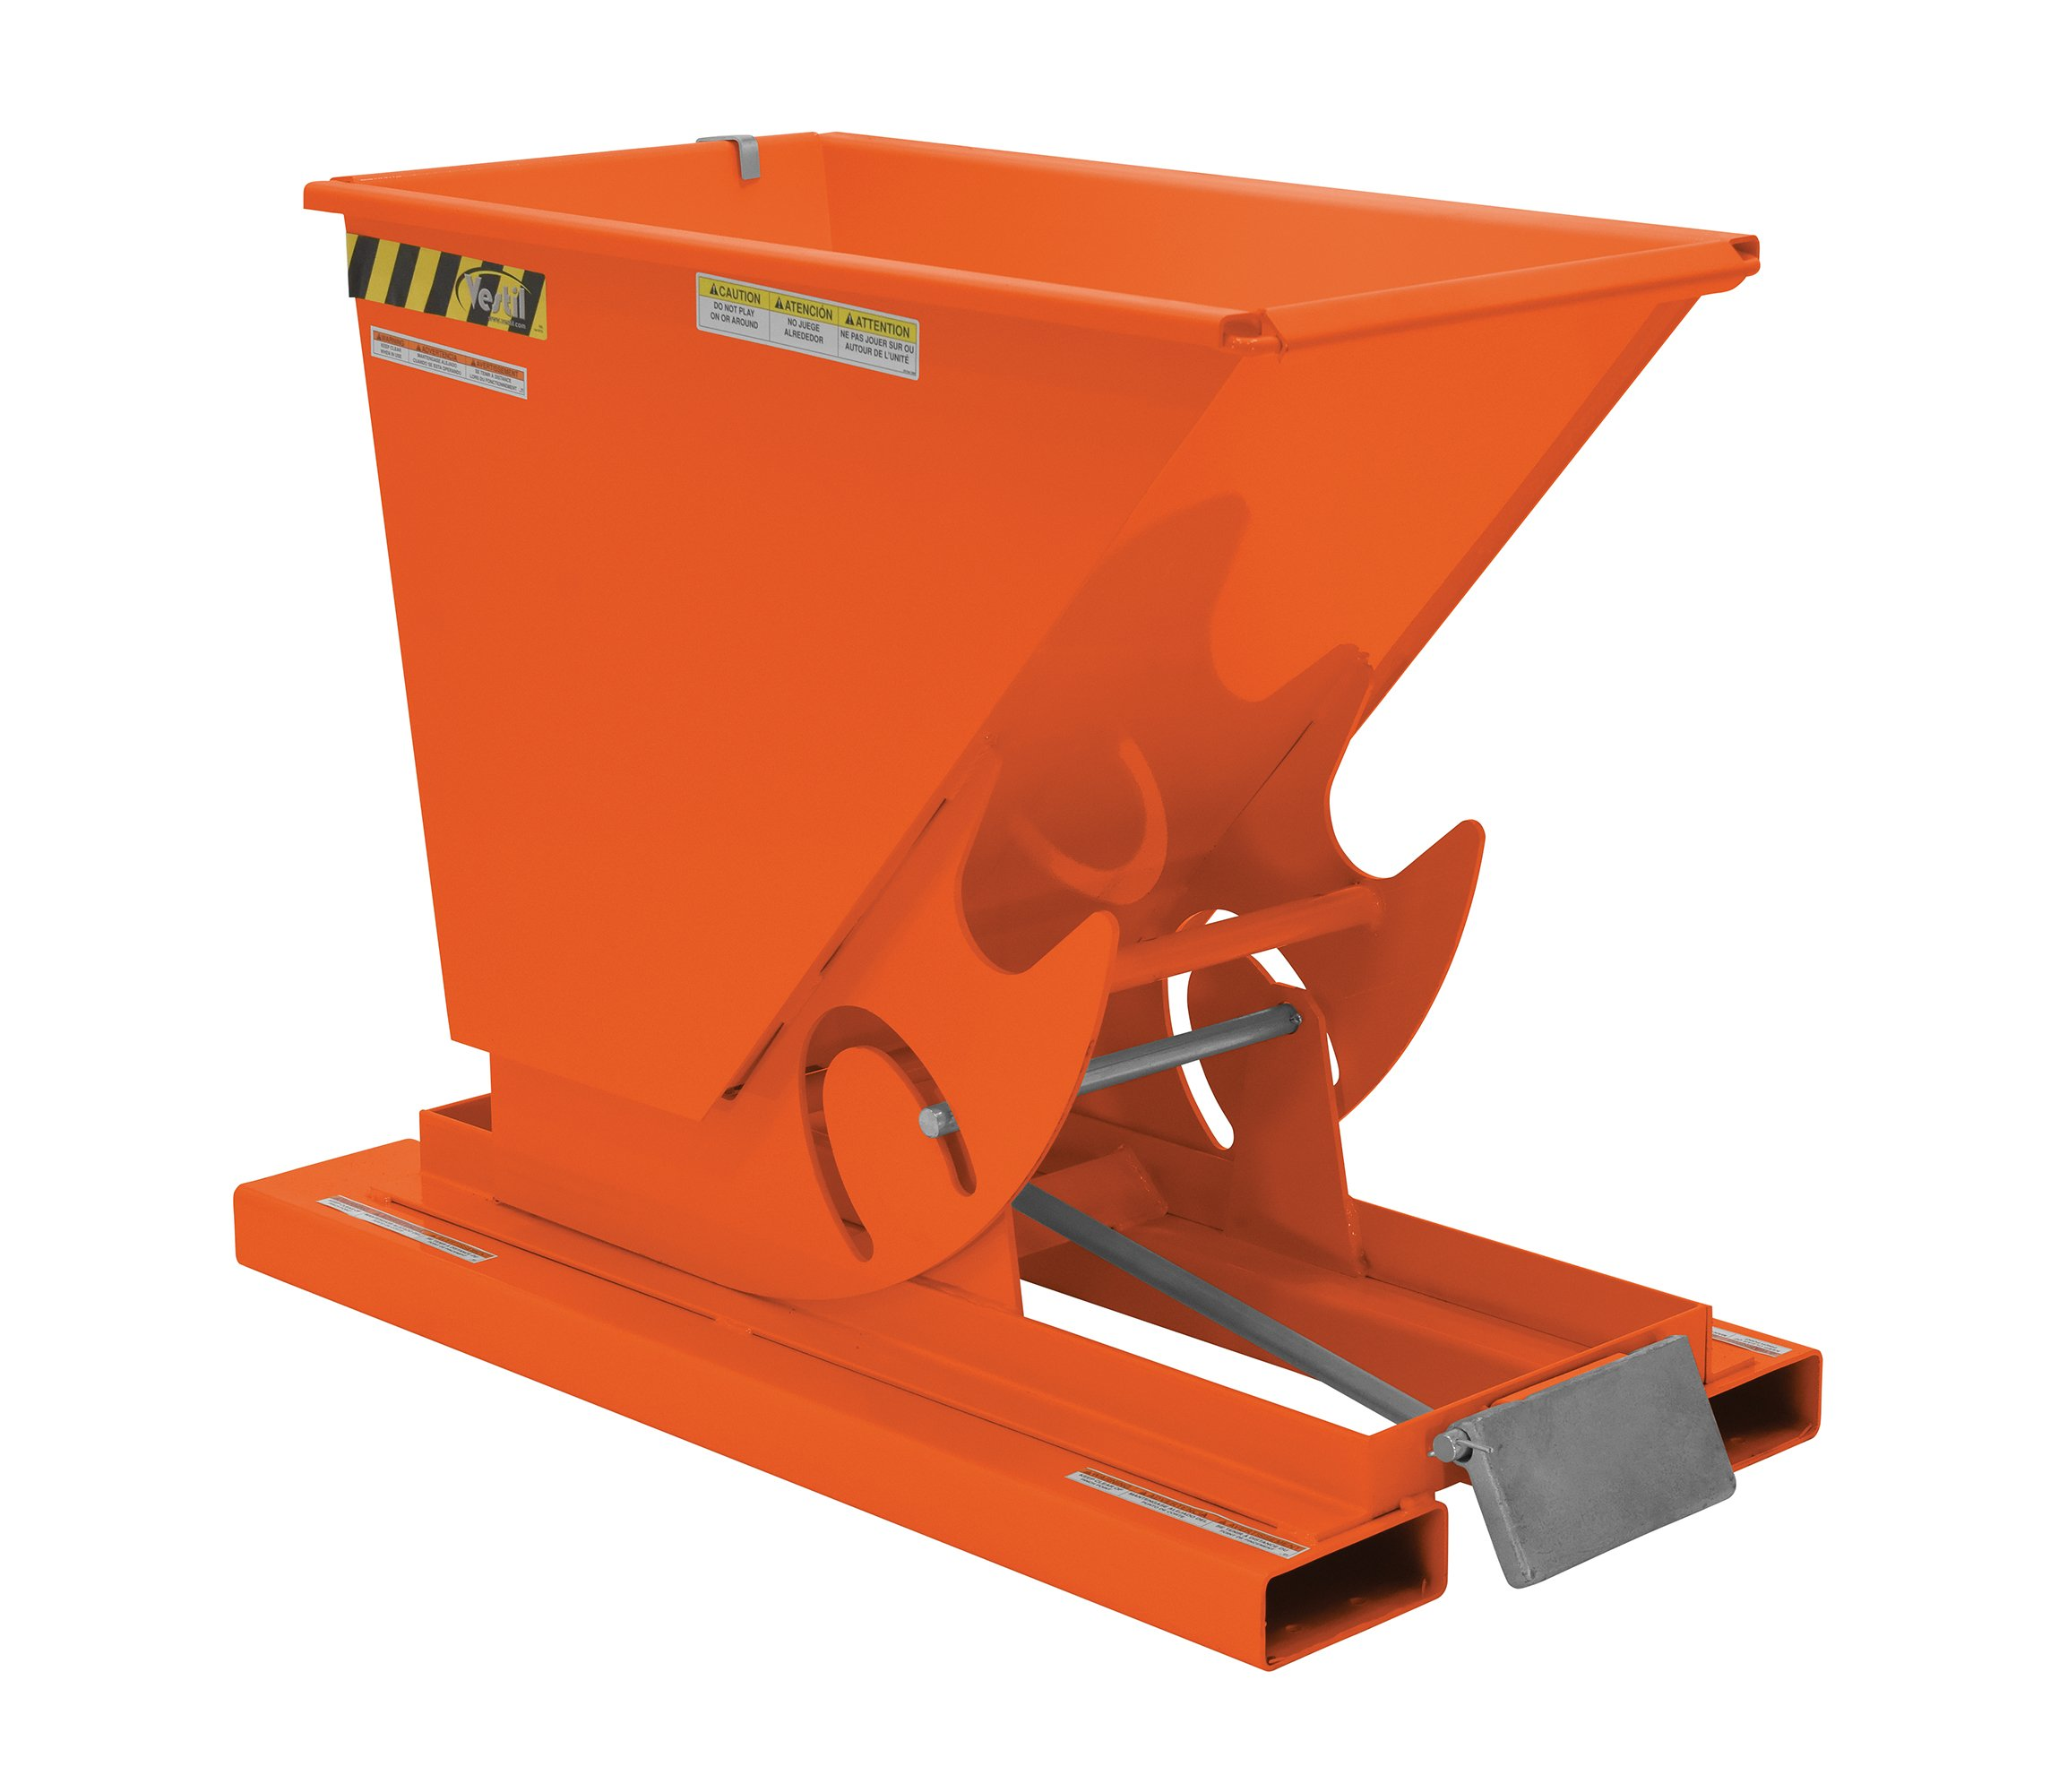 Vestil D-25-MD-ORG-C Self-Dump MD Hopper, 0.25 cu. yd, 4000 lb. Capacity, Overall L x W x H (in.) 51-7/8'' x 26'' x 38-1/16, Orange